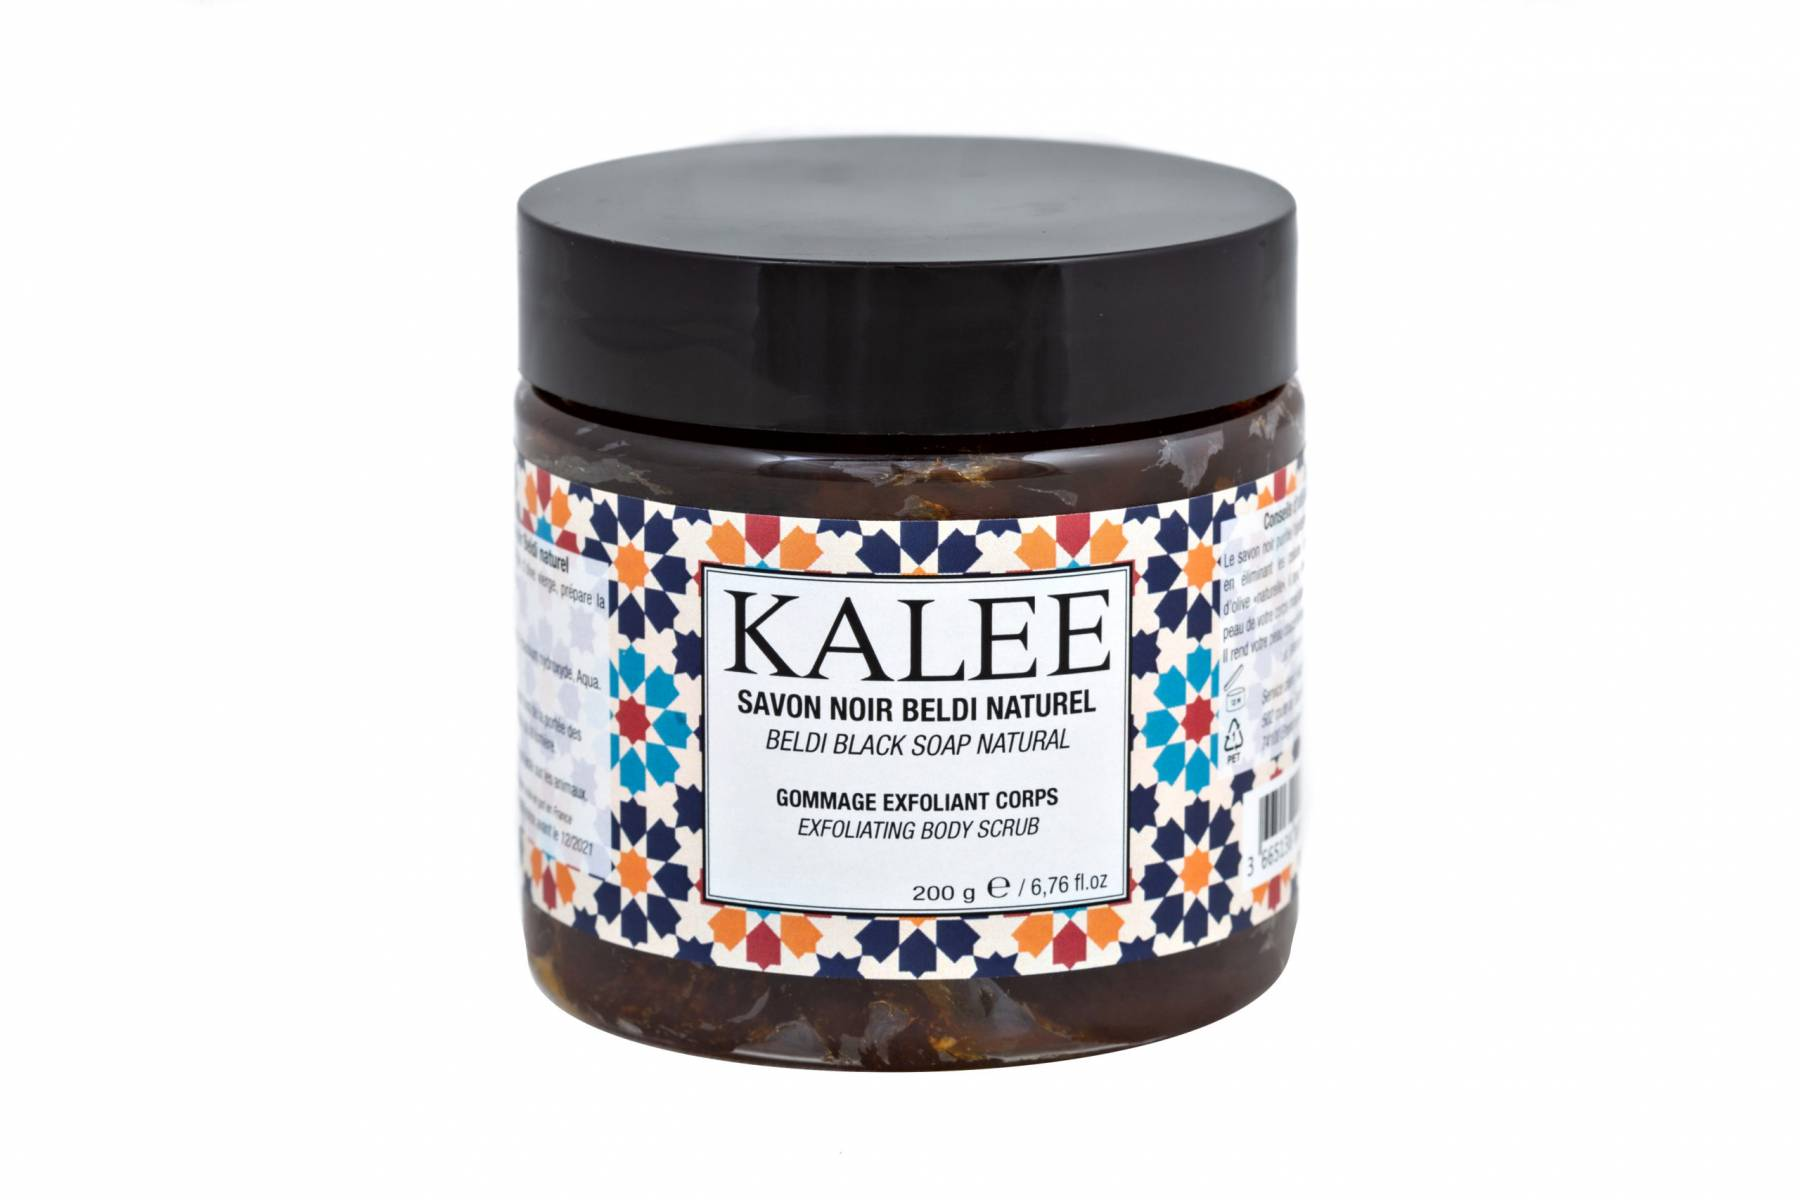 Kalee Beauty Savon noir beldi gommage corps